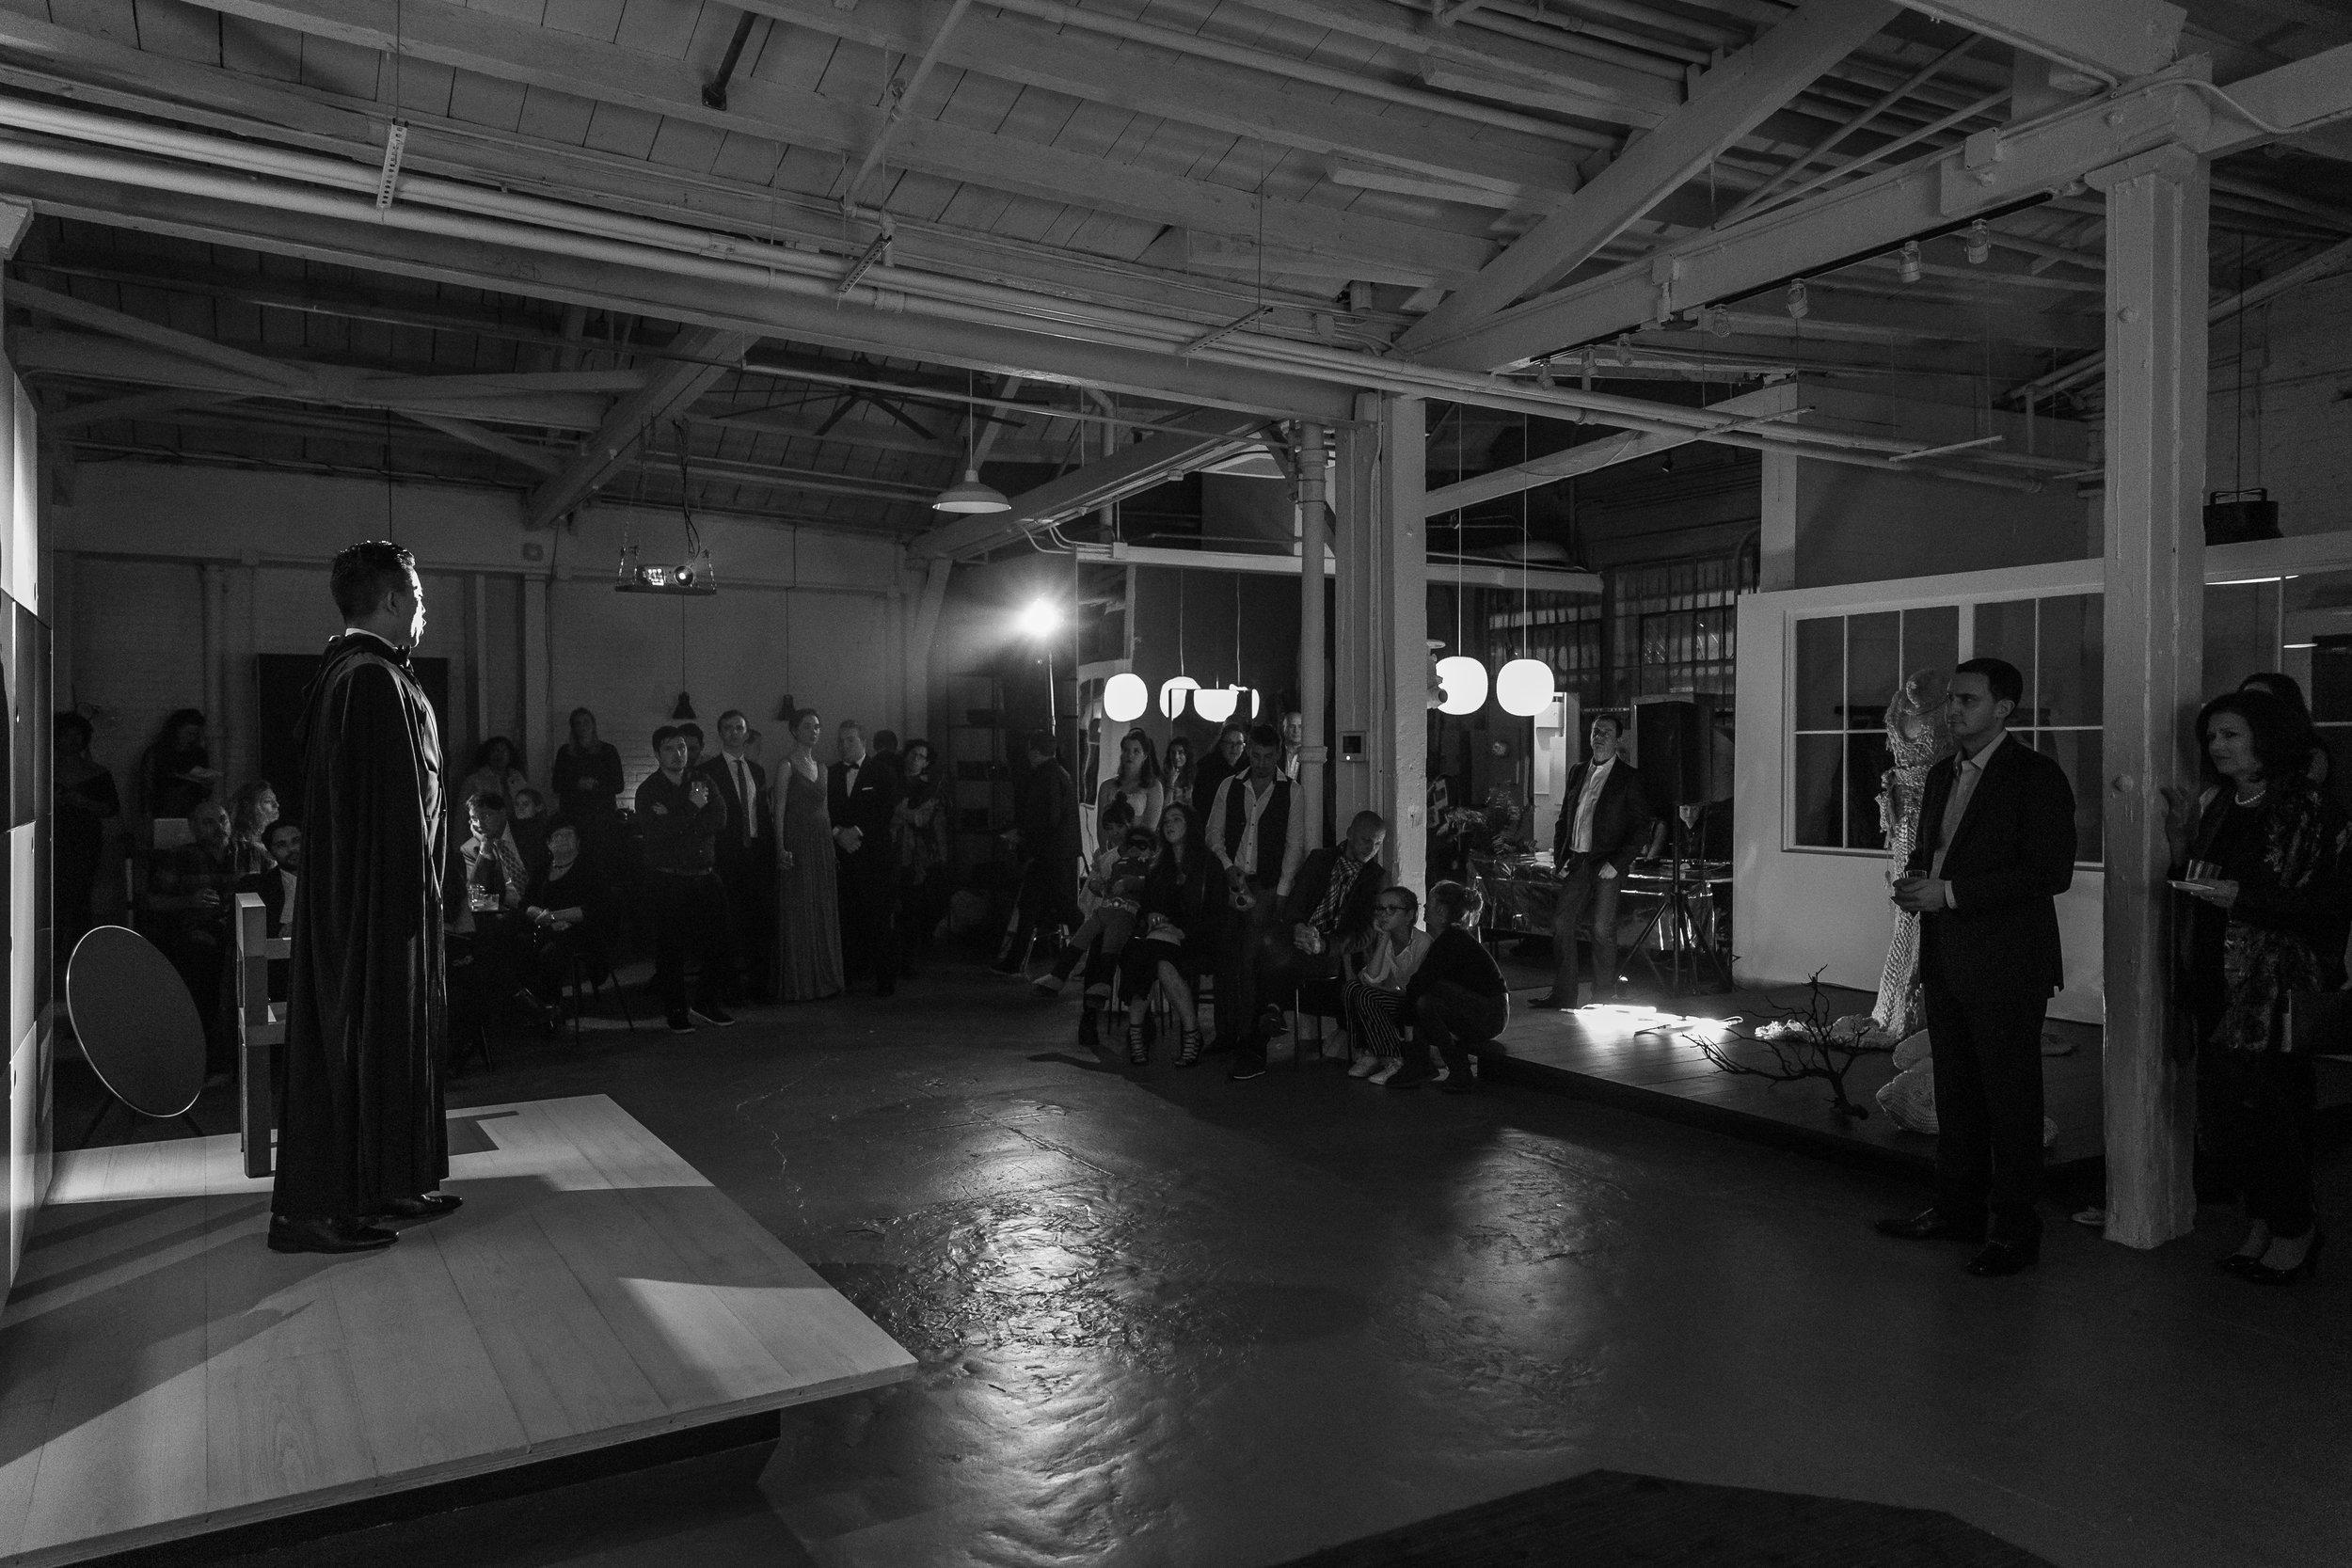 20171026 - Bare Opera's 3rd Annual Gala Event 0042.jpg